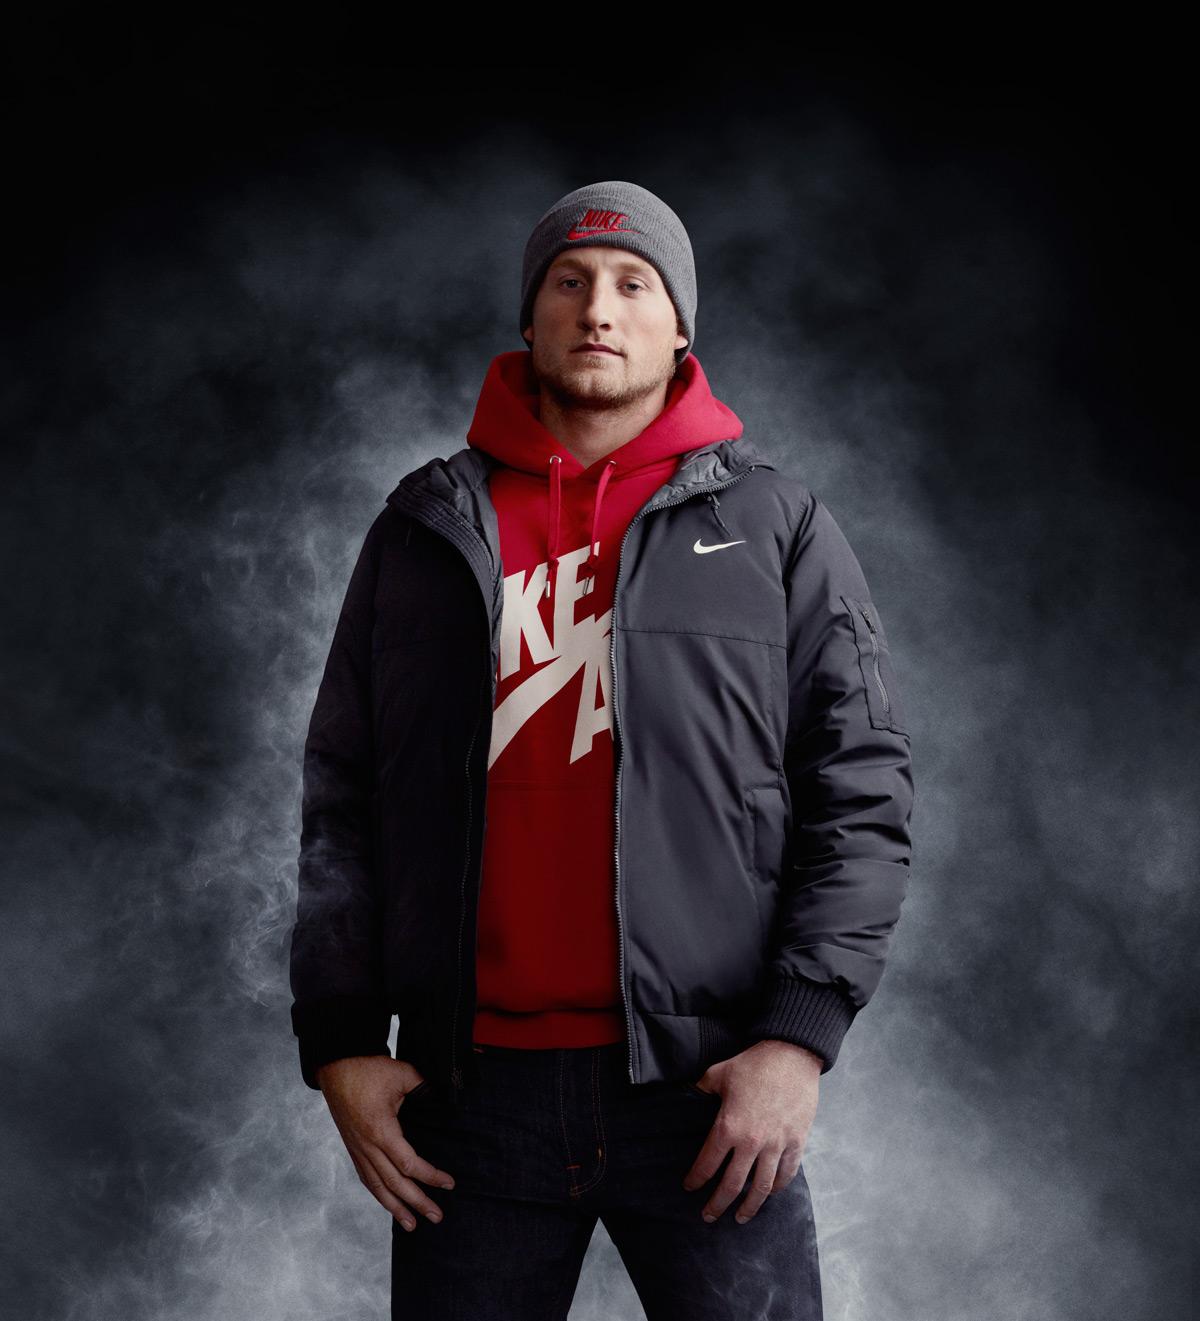 Nike_Ho12_NSW_Stamkos_f2_Layers.jpg